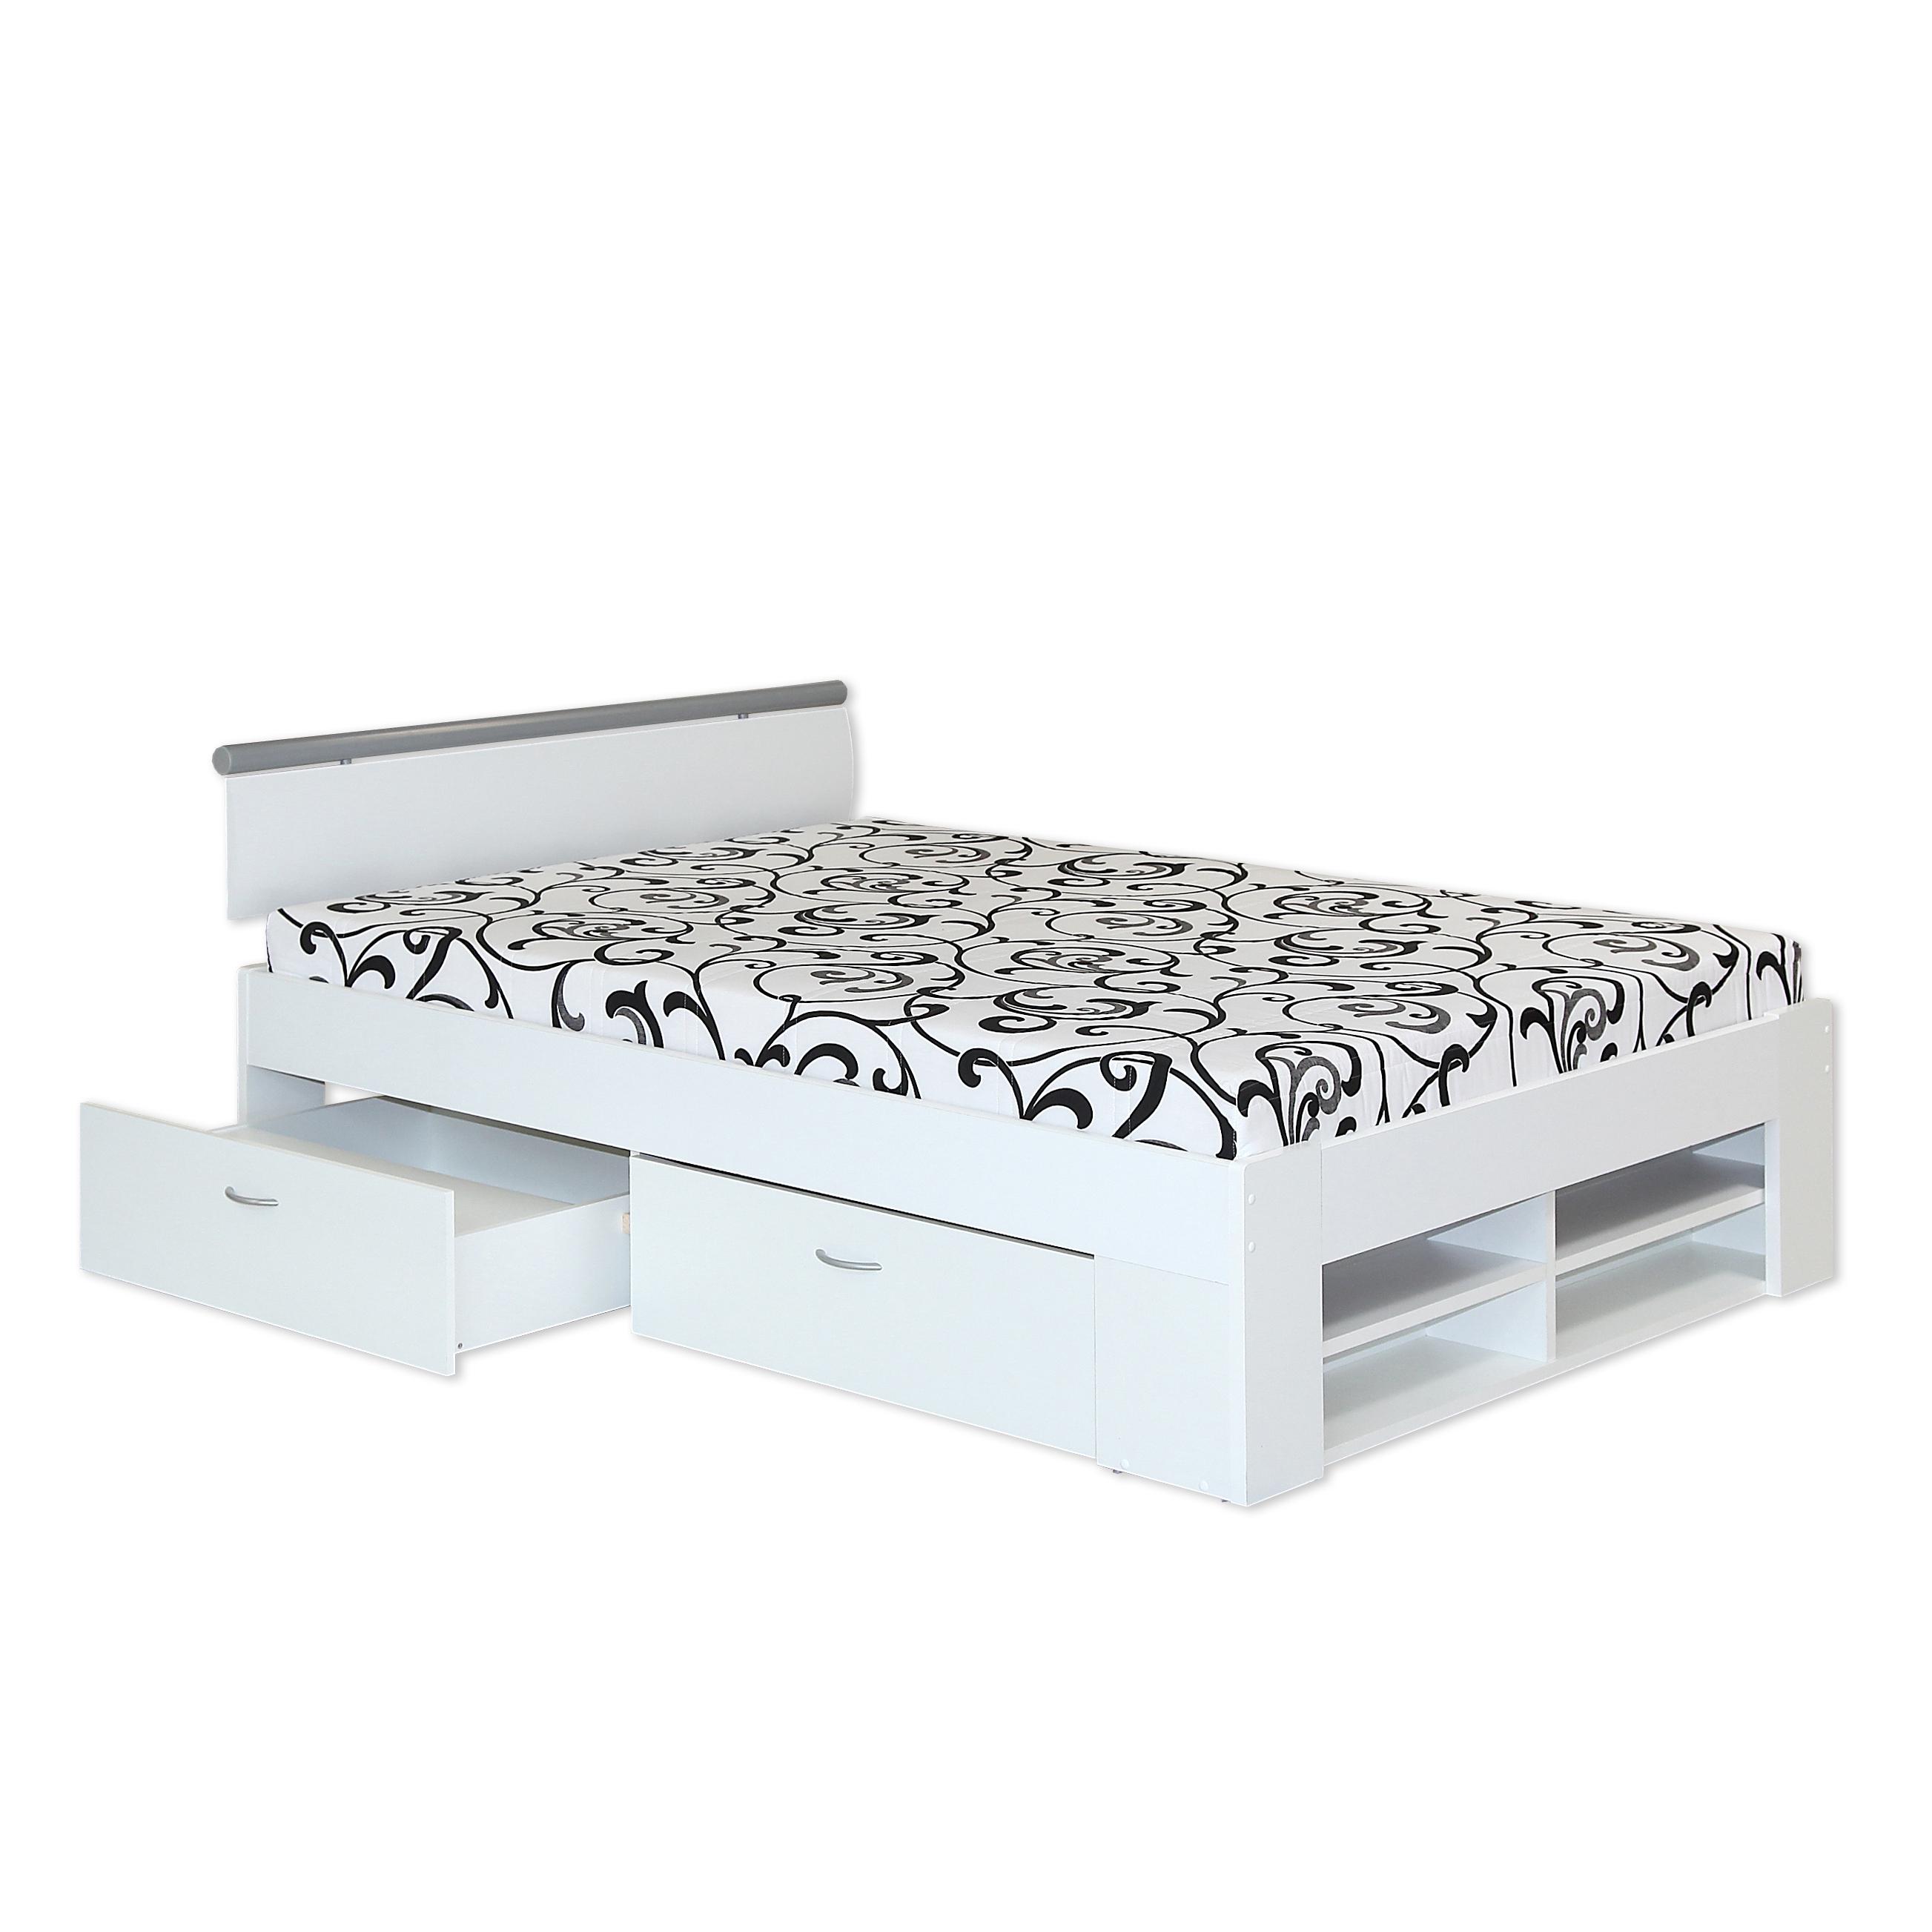 Bett 120x200 Weiss Mit Schubladen 10 Deutsche Dekor 2019 Wohnkultur Online Kaufen Bett 120x200 Bett Mit Lattenrost Bett 120x200 Weiss